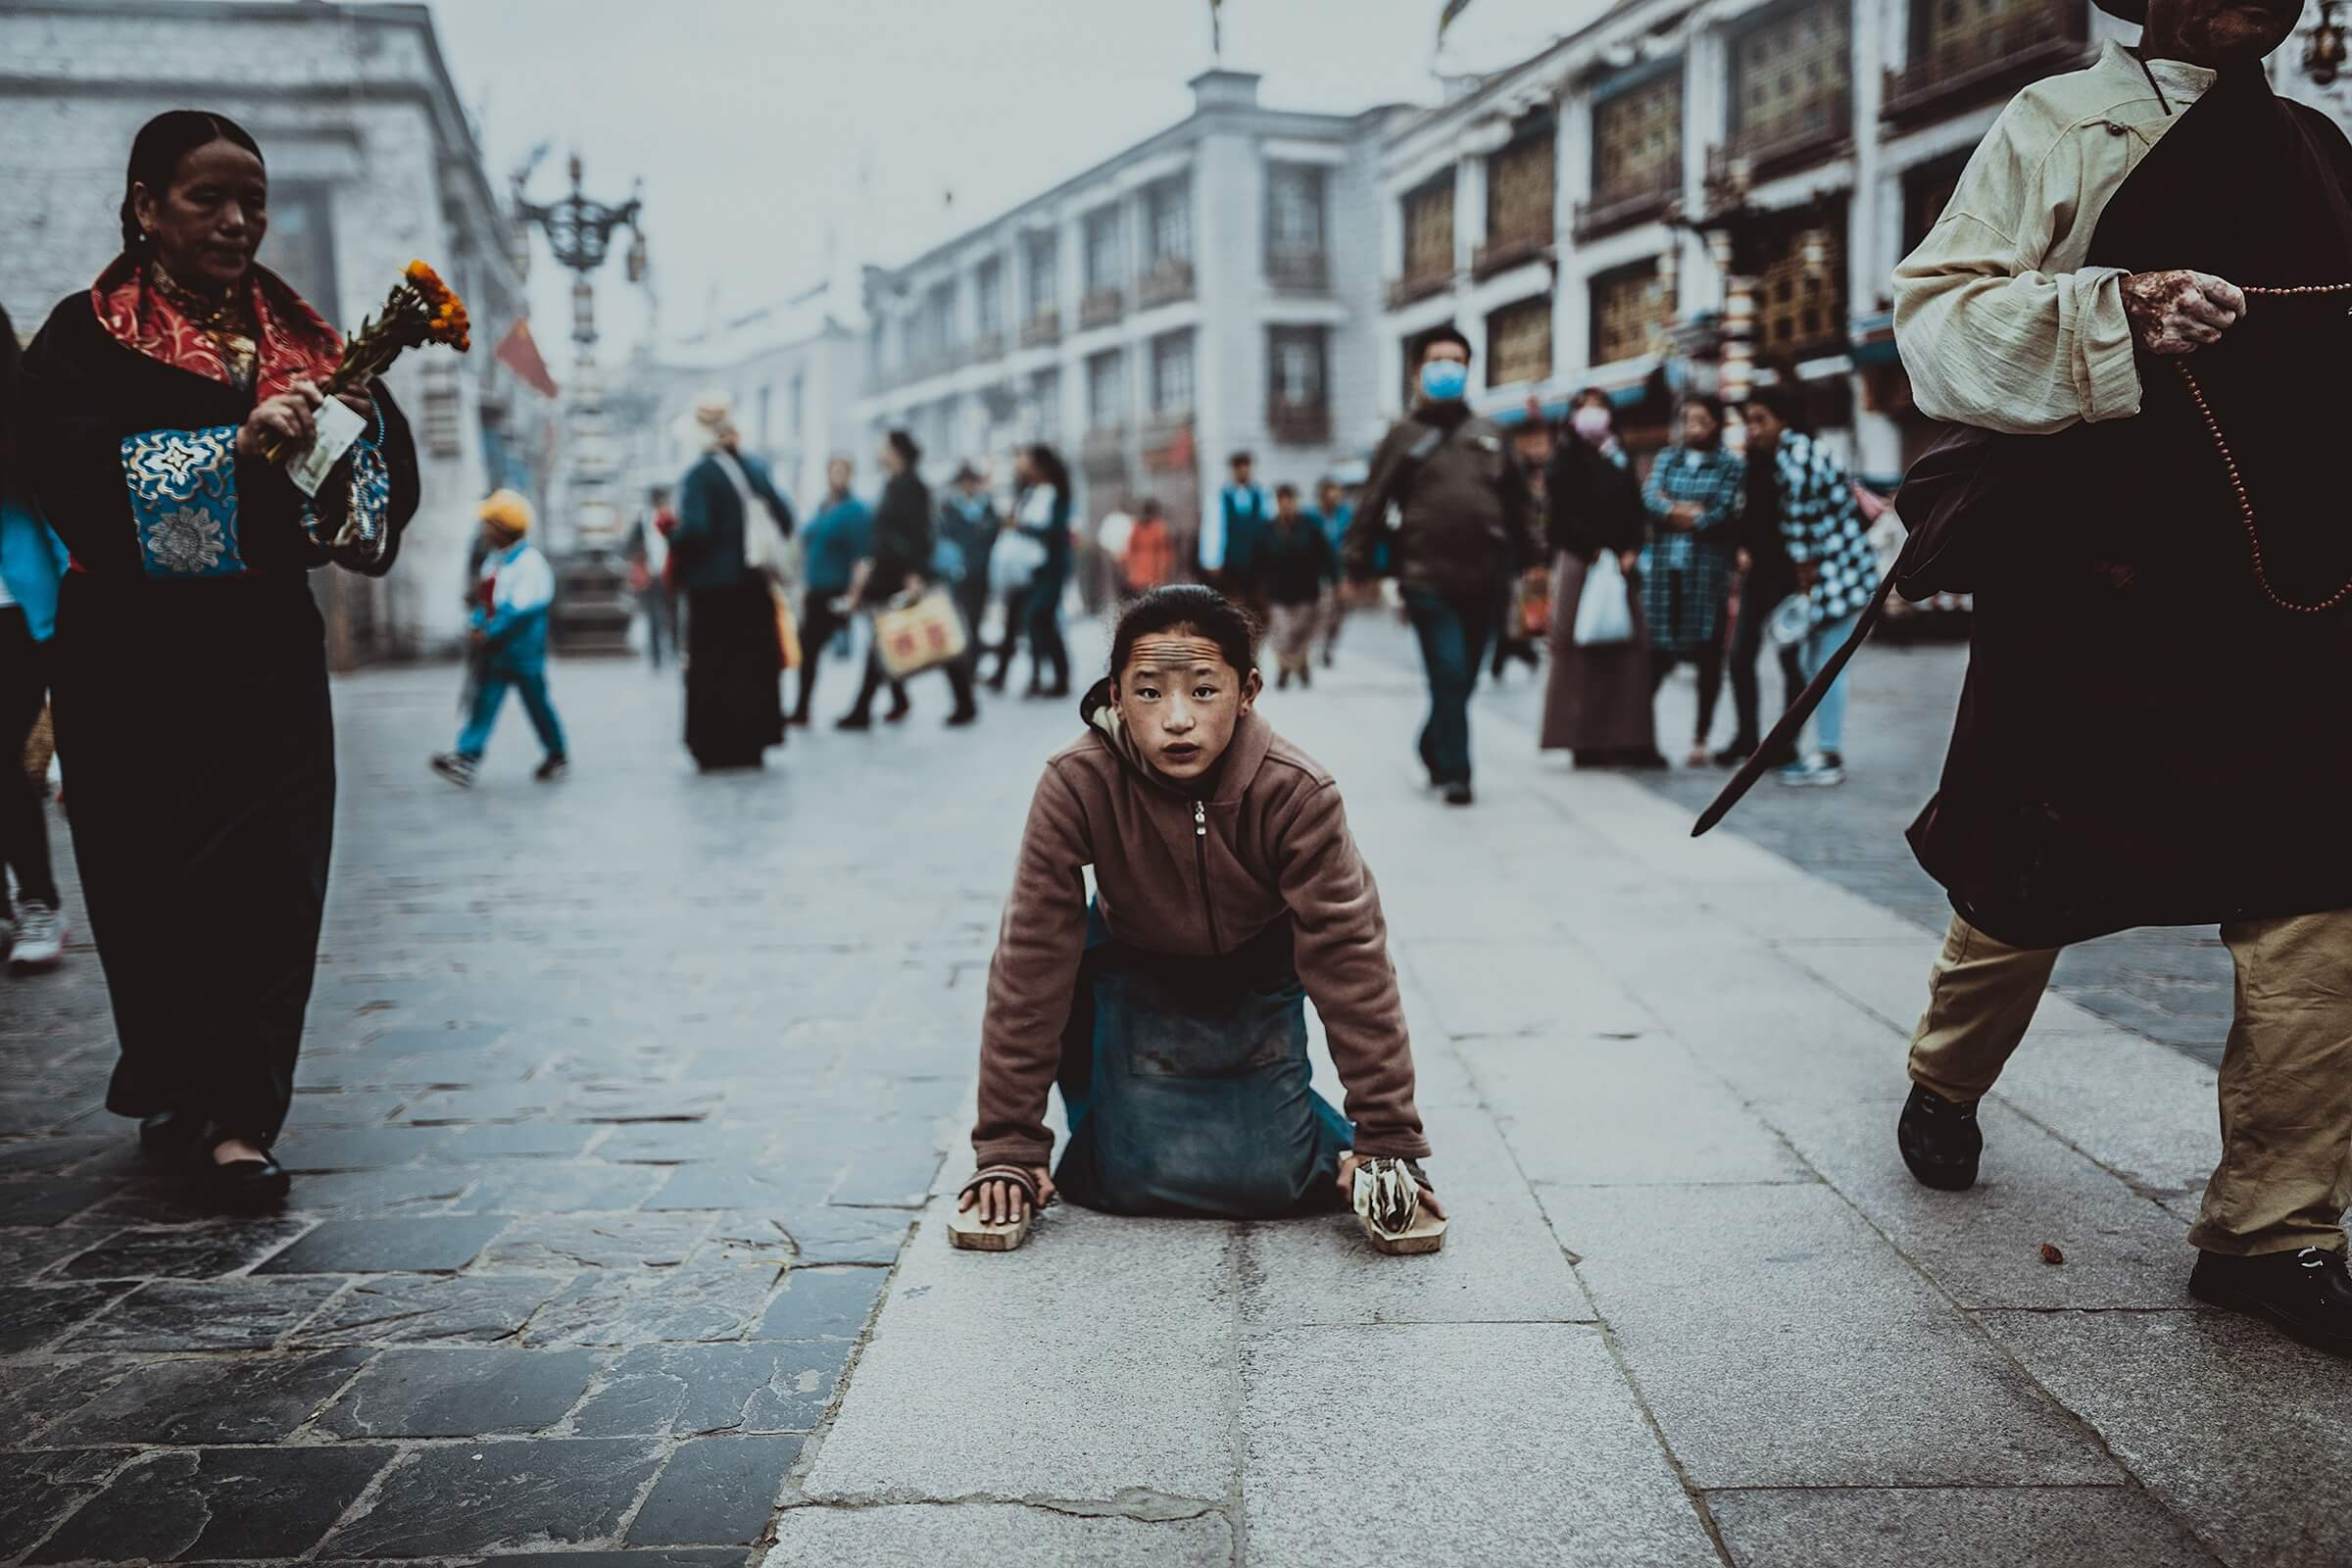 Girl Kneeling in Busy Street